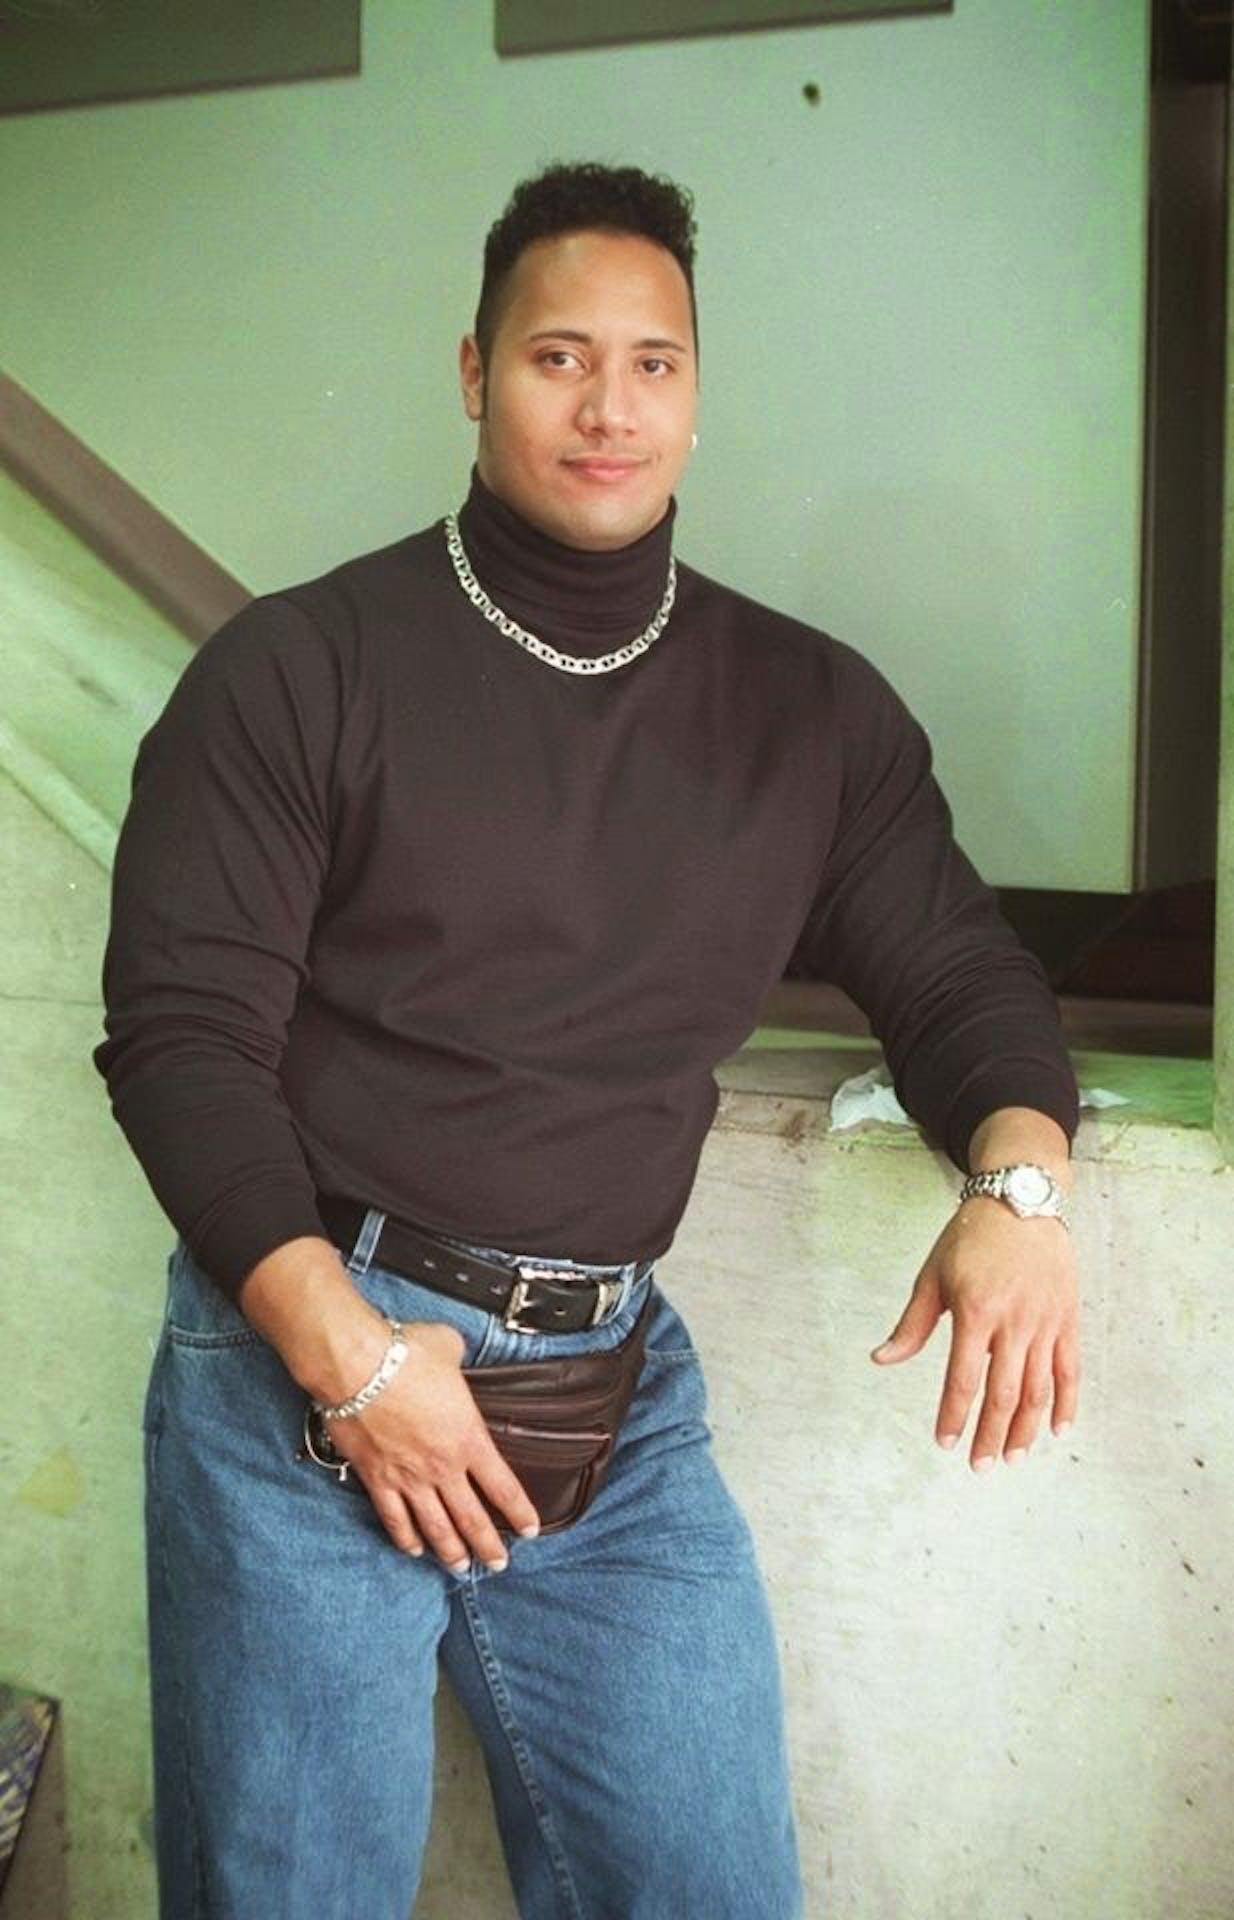 Dwayne The Rock Johsnon fanny pack vintage with hair hair loss alopecia bald balding